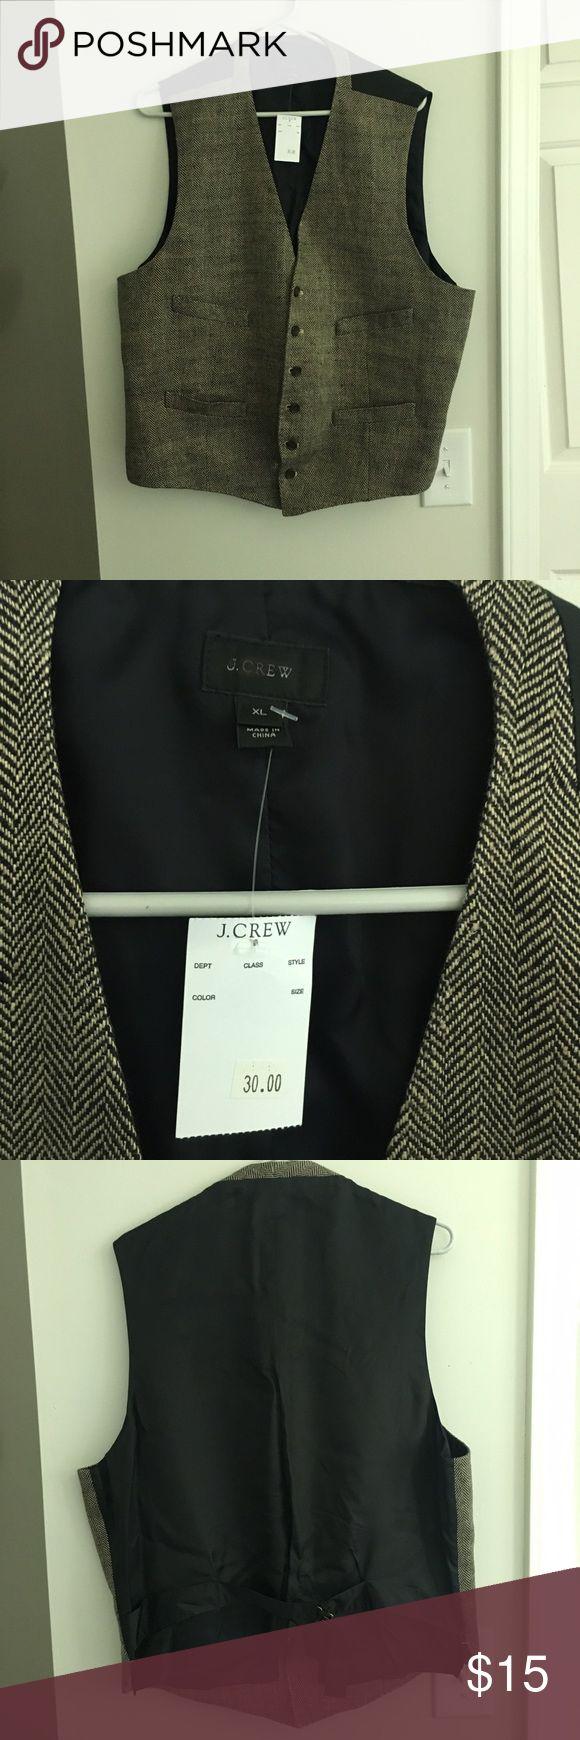 NWT J. Crew Tweed Vest Tweed vest by J.Crew, brown tweed herringbone pattern, size XL, never been worn! Also have one in Sz M if wanting to bundle! J. Crew Suits & Blazers Vests